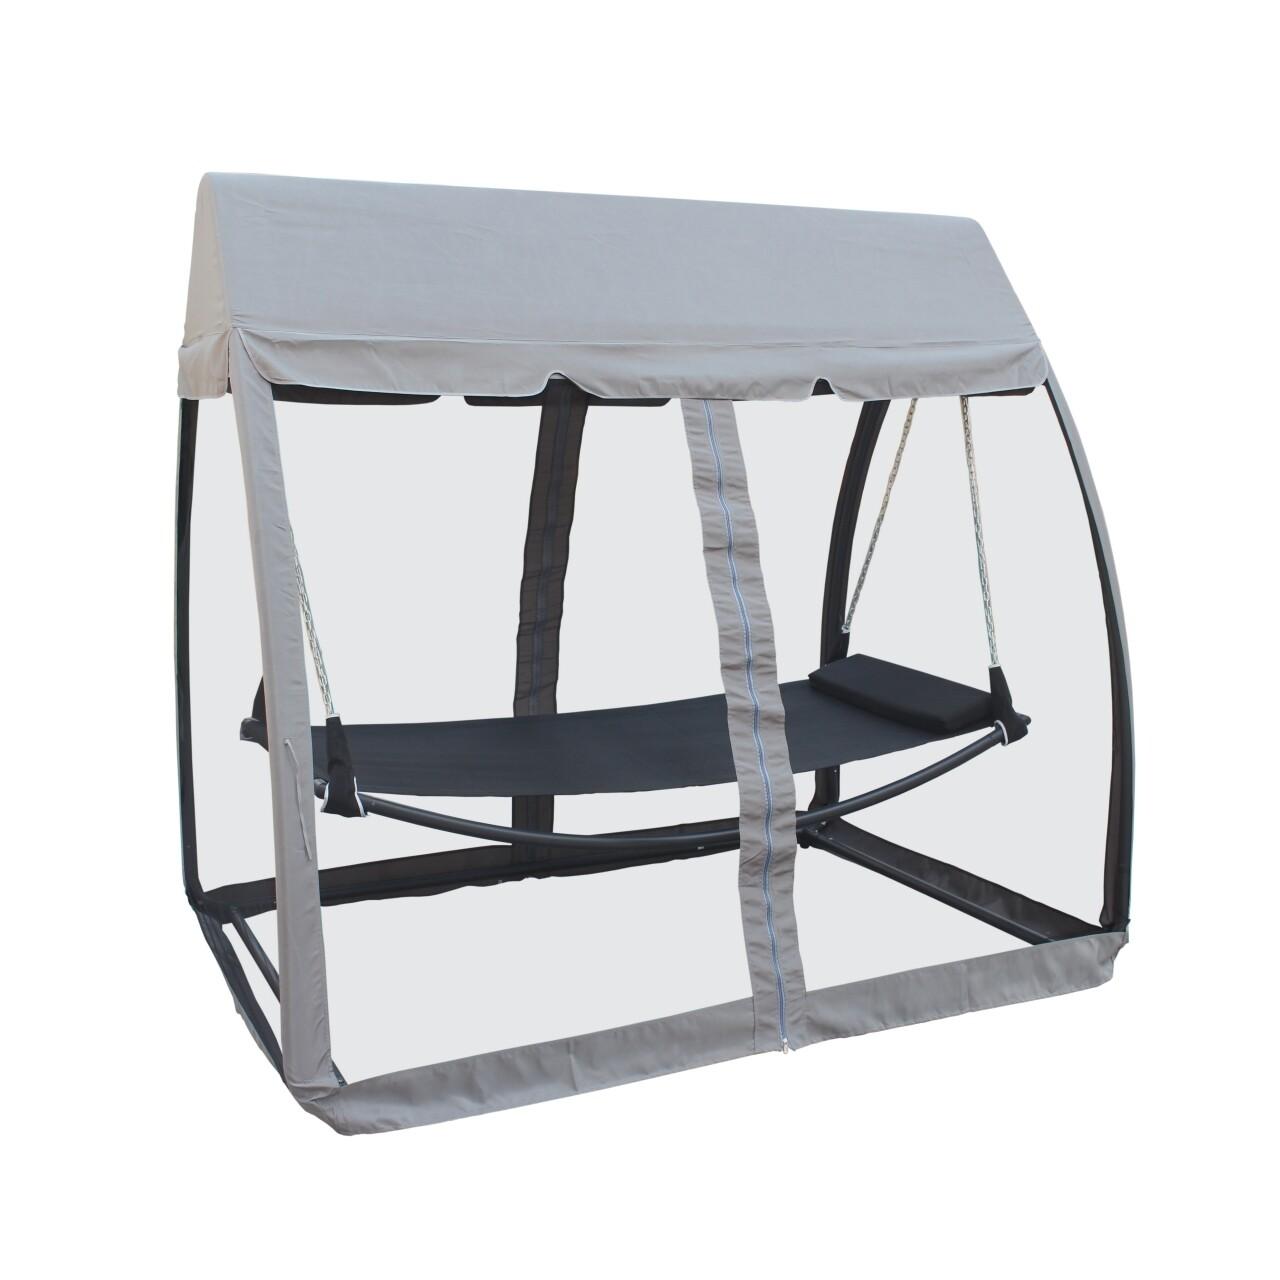 Balansoar cu acoperis, Heinner, 223x151x208cm, gri/negru